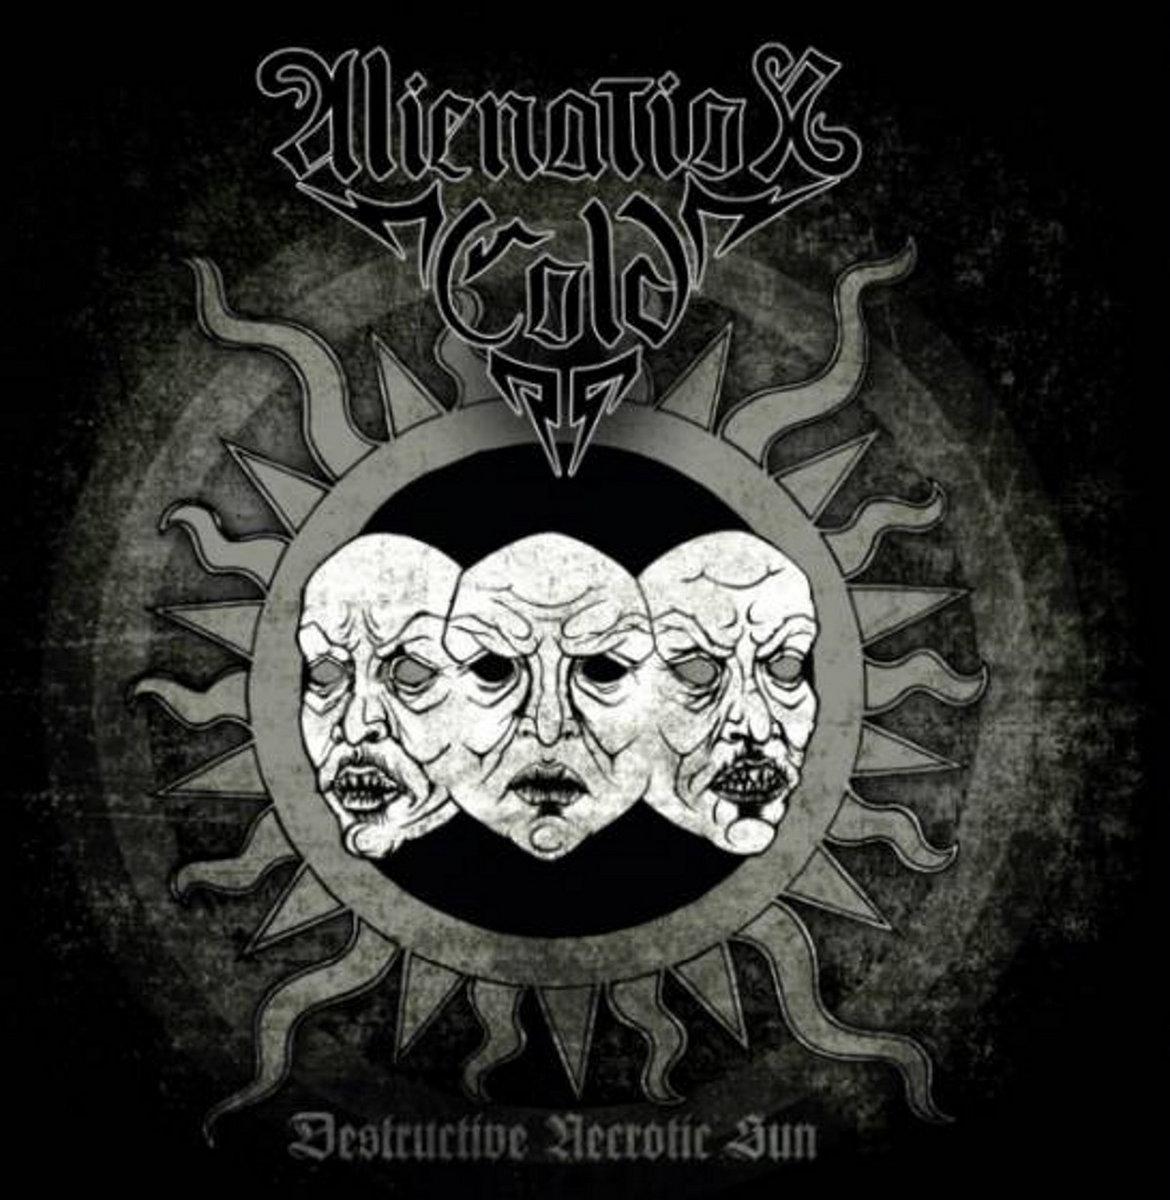 ALIENATION COLD - Destructive Necrotic Sun Digi-CD | Possession